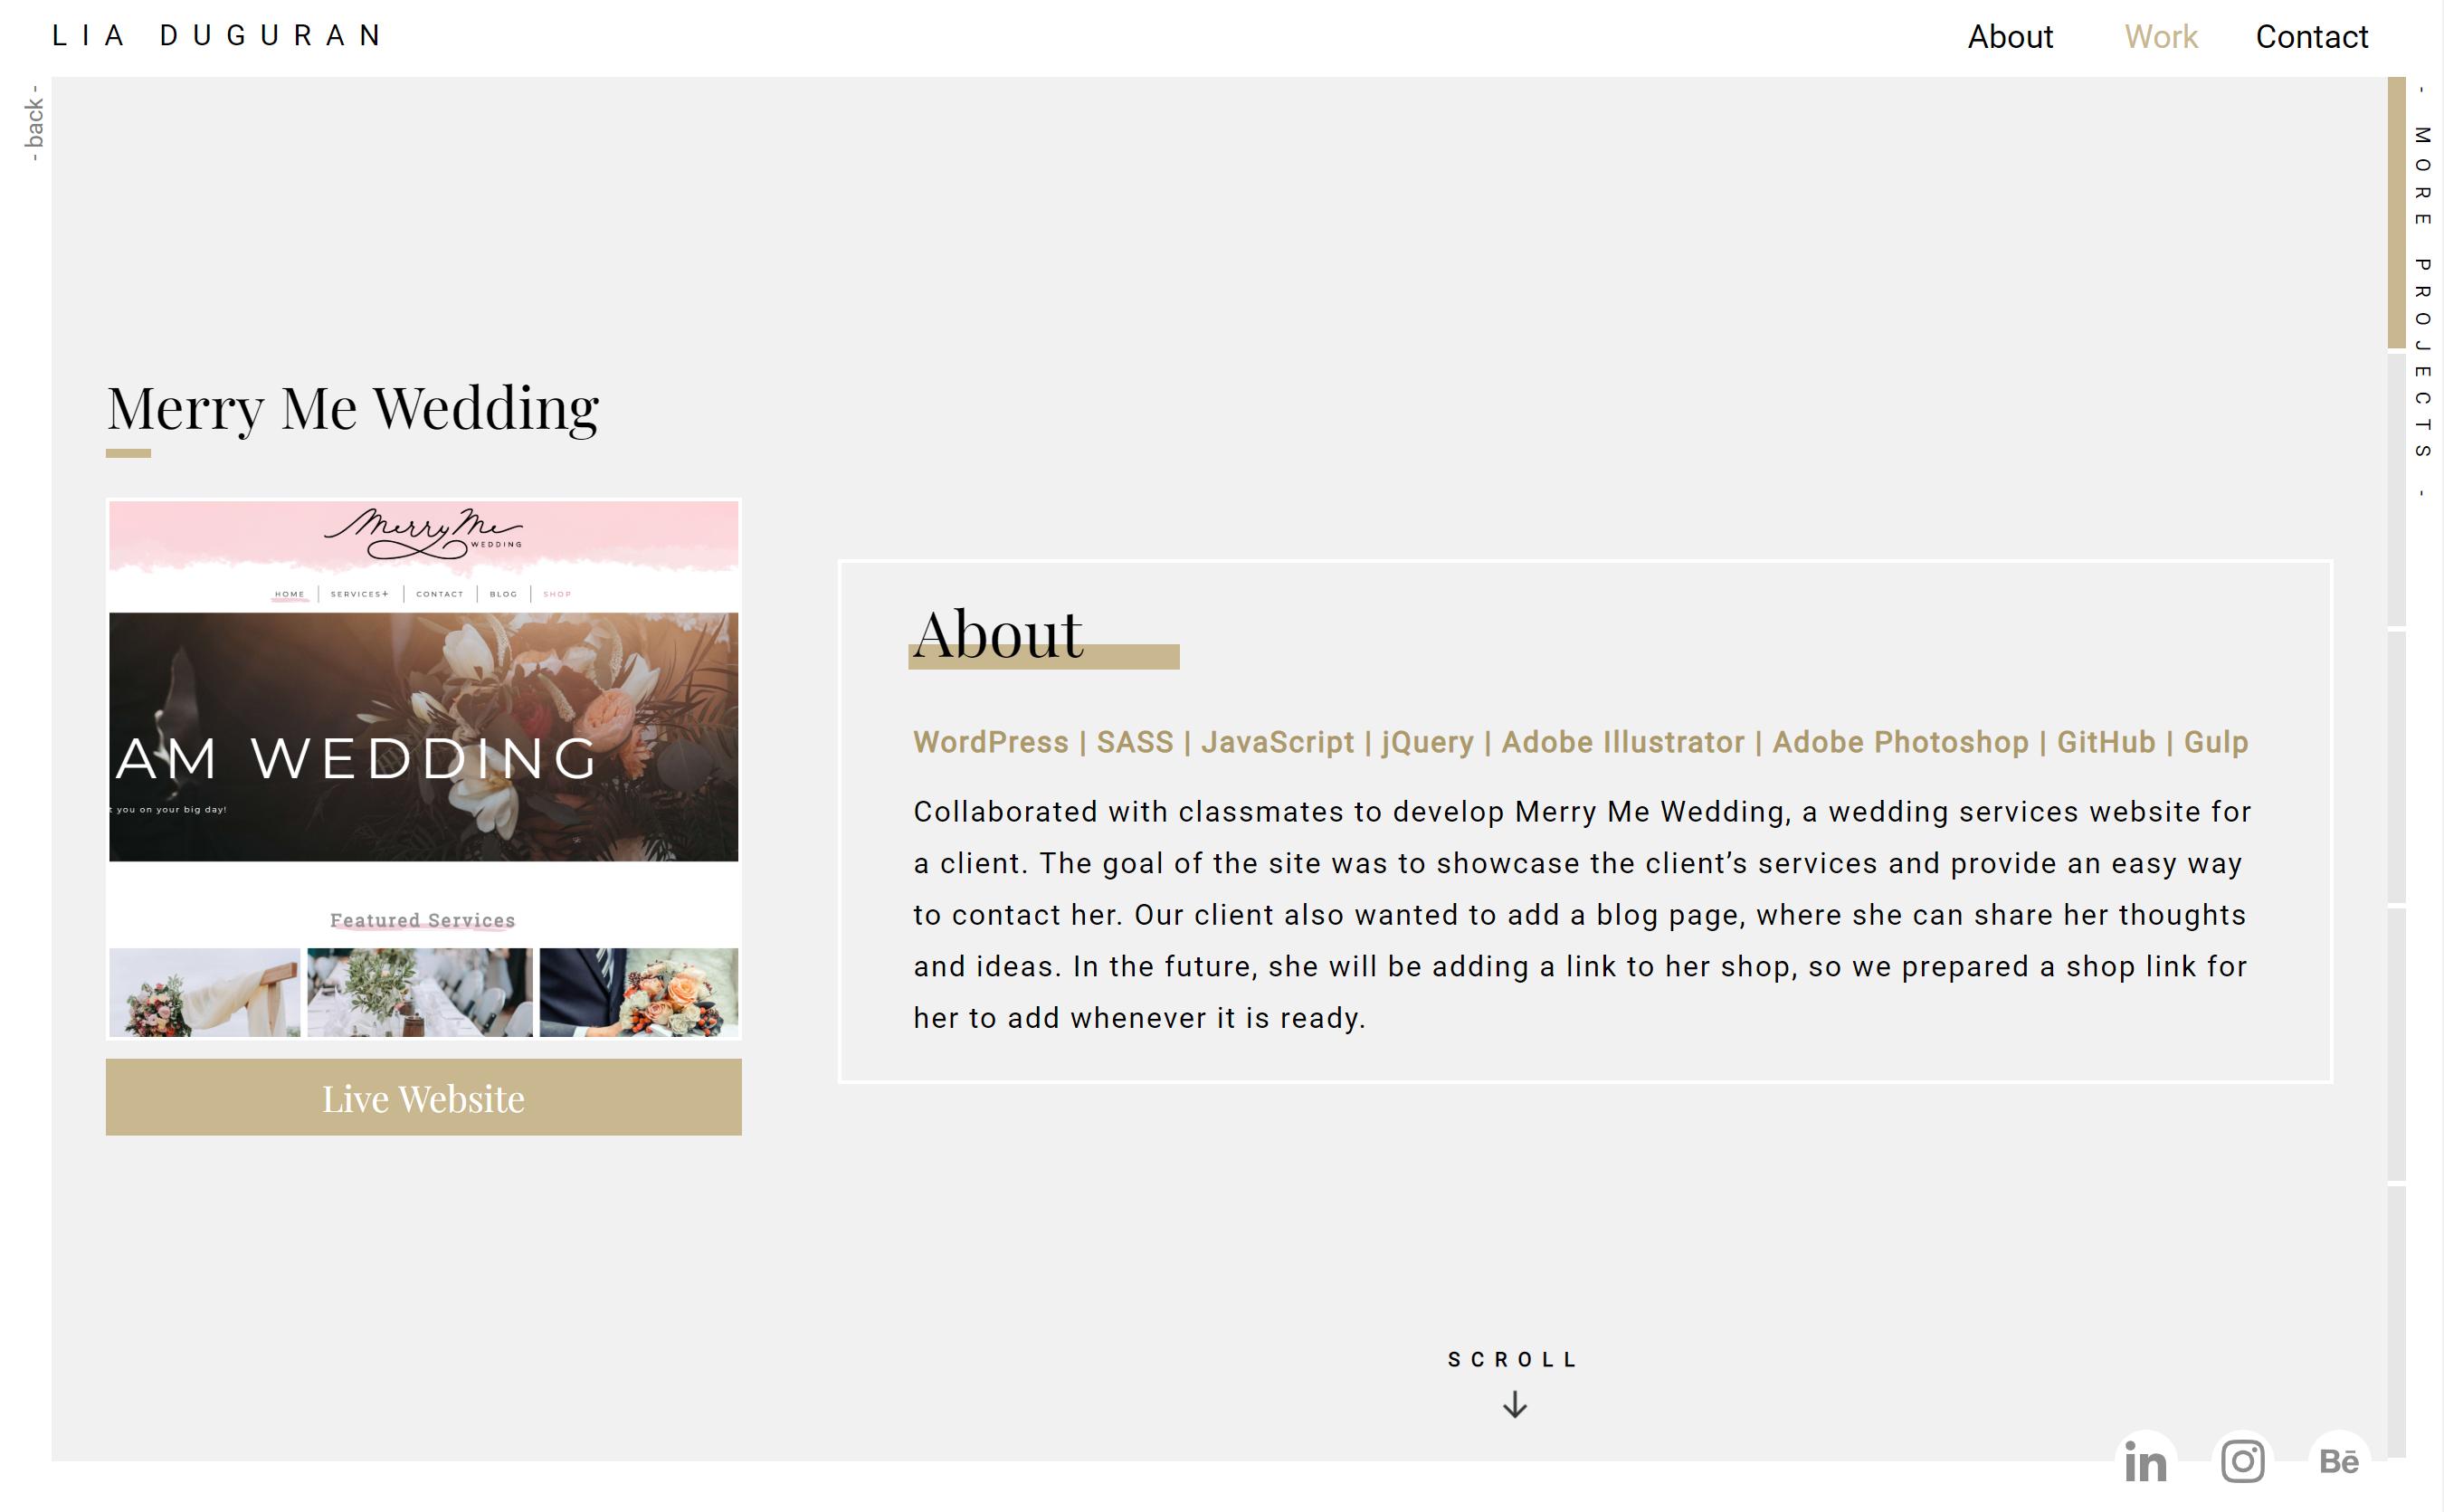 Portfolio details page